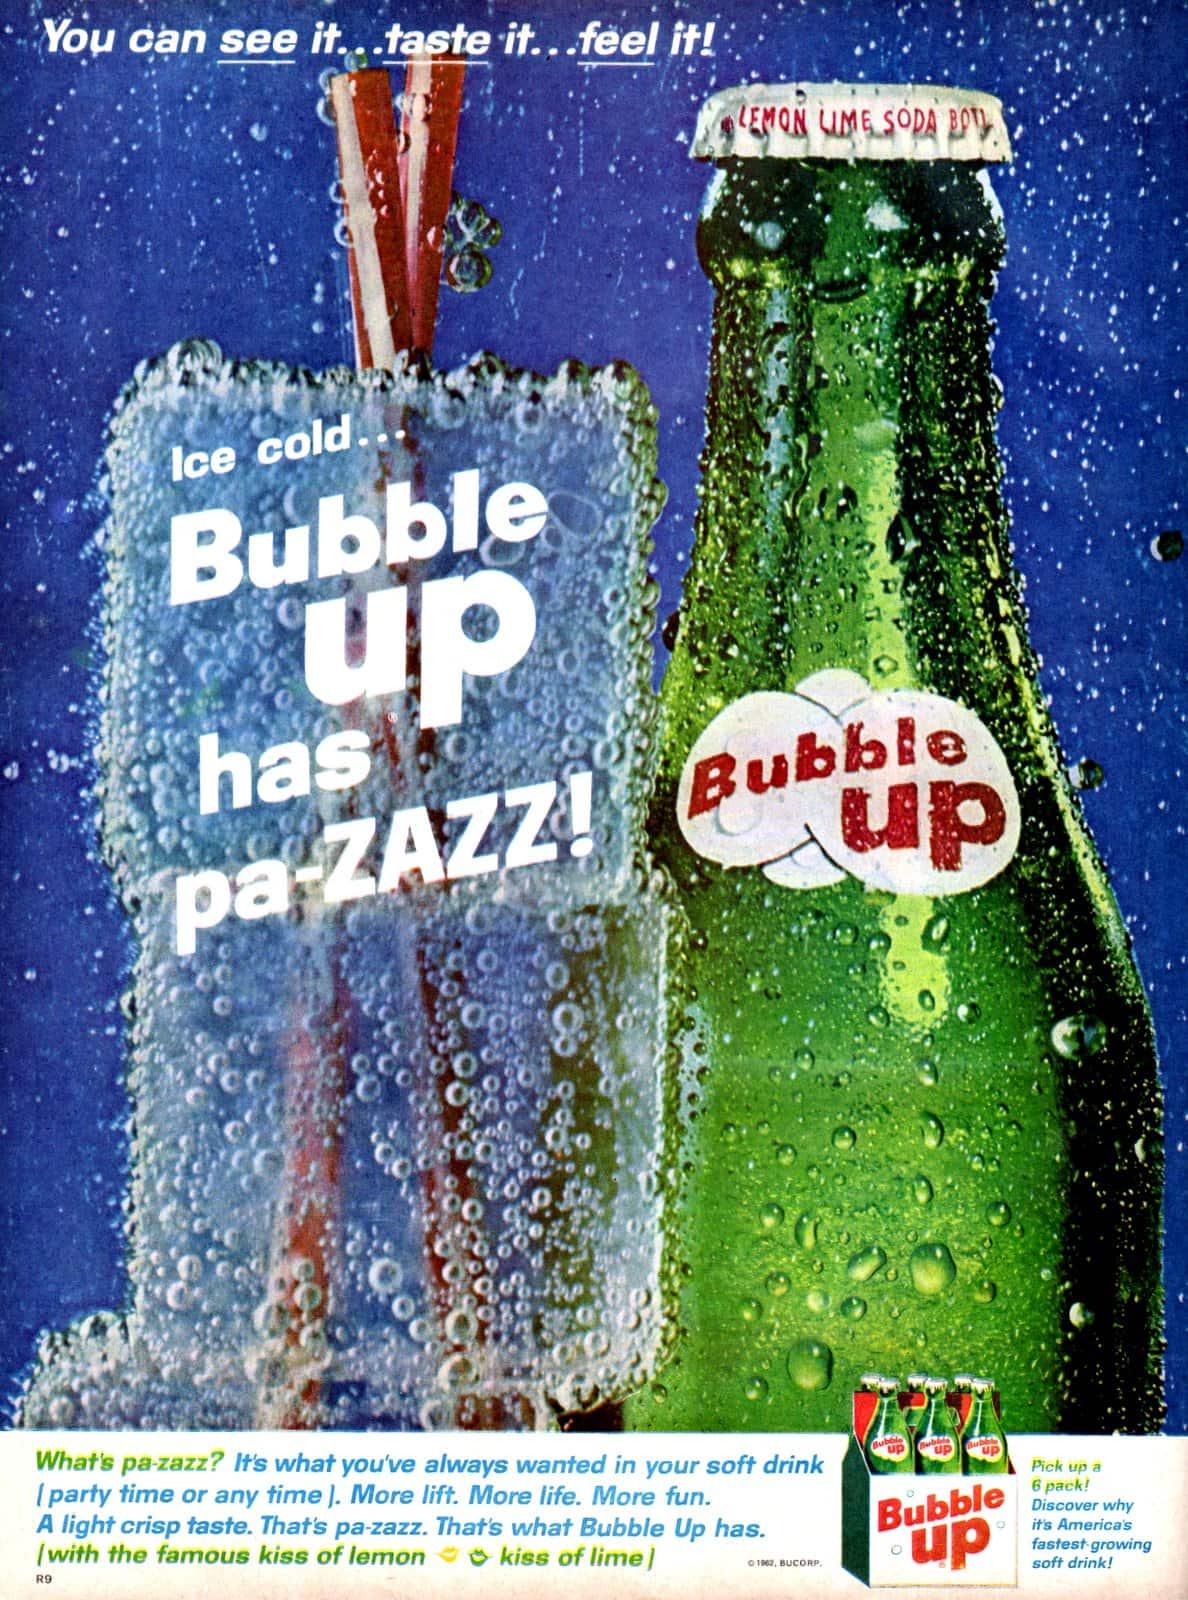 Ice cold... Bubble Up has pa-ZAZZ (1962)